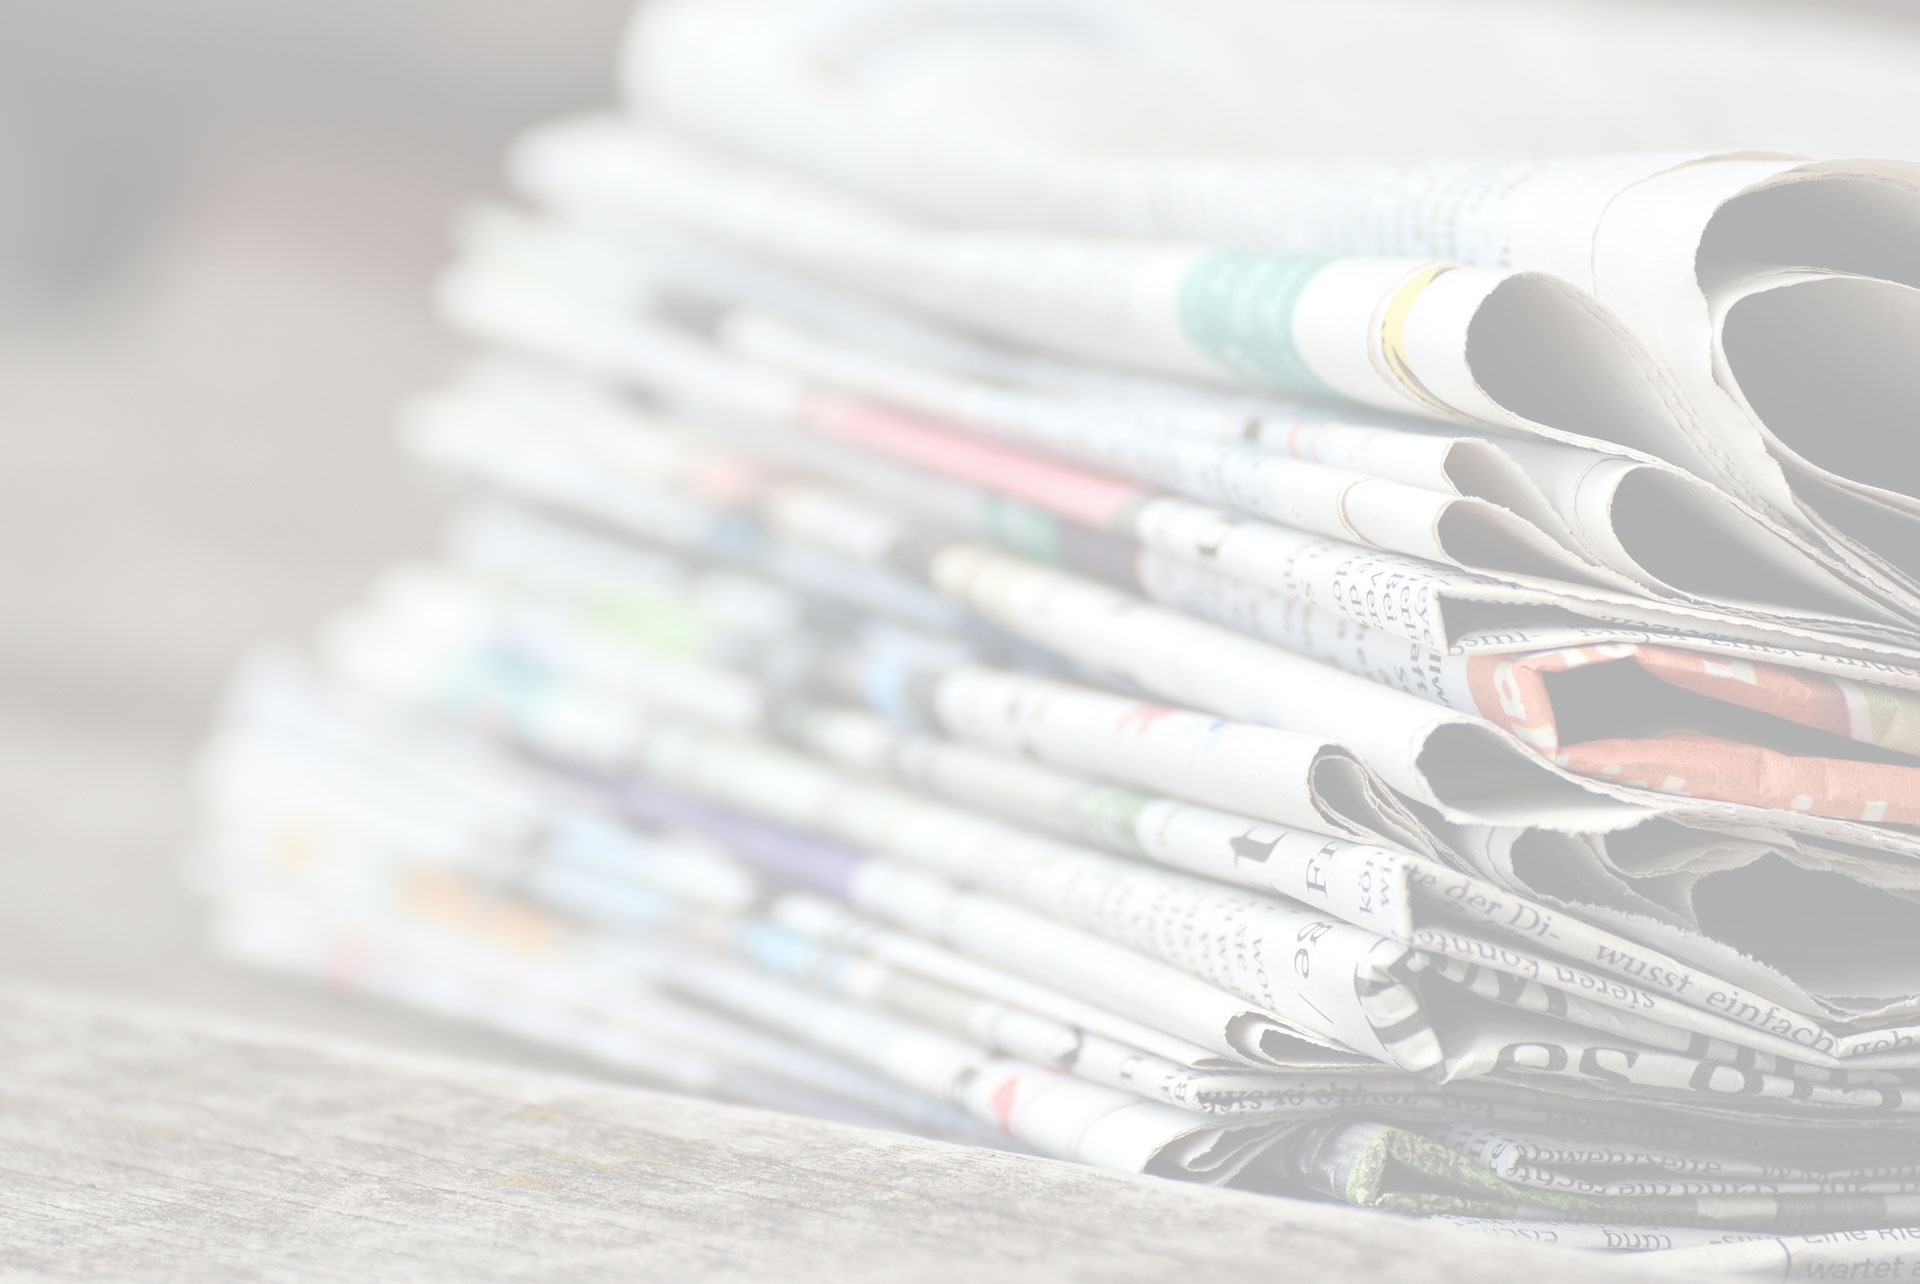 Nicola Zingaretti, Luigi Di Maio e Giuseppe Conte